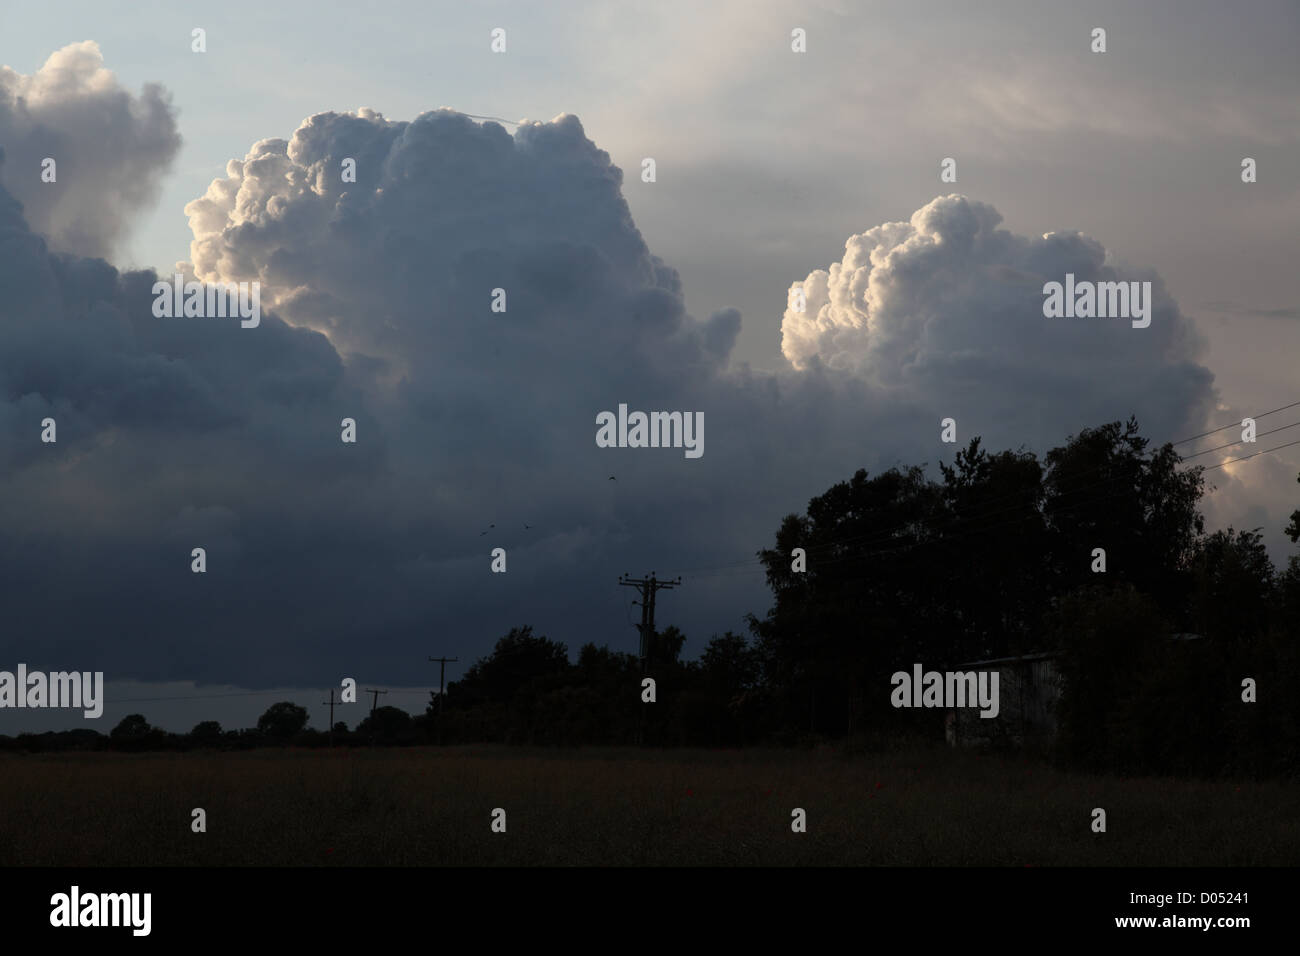 threatening cumulonimbus clouds seen in the UK in the late summer evening threatening a summer storm - Stock Image